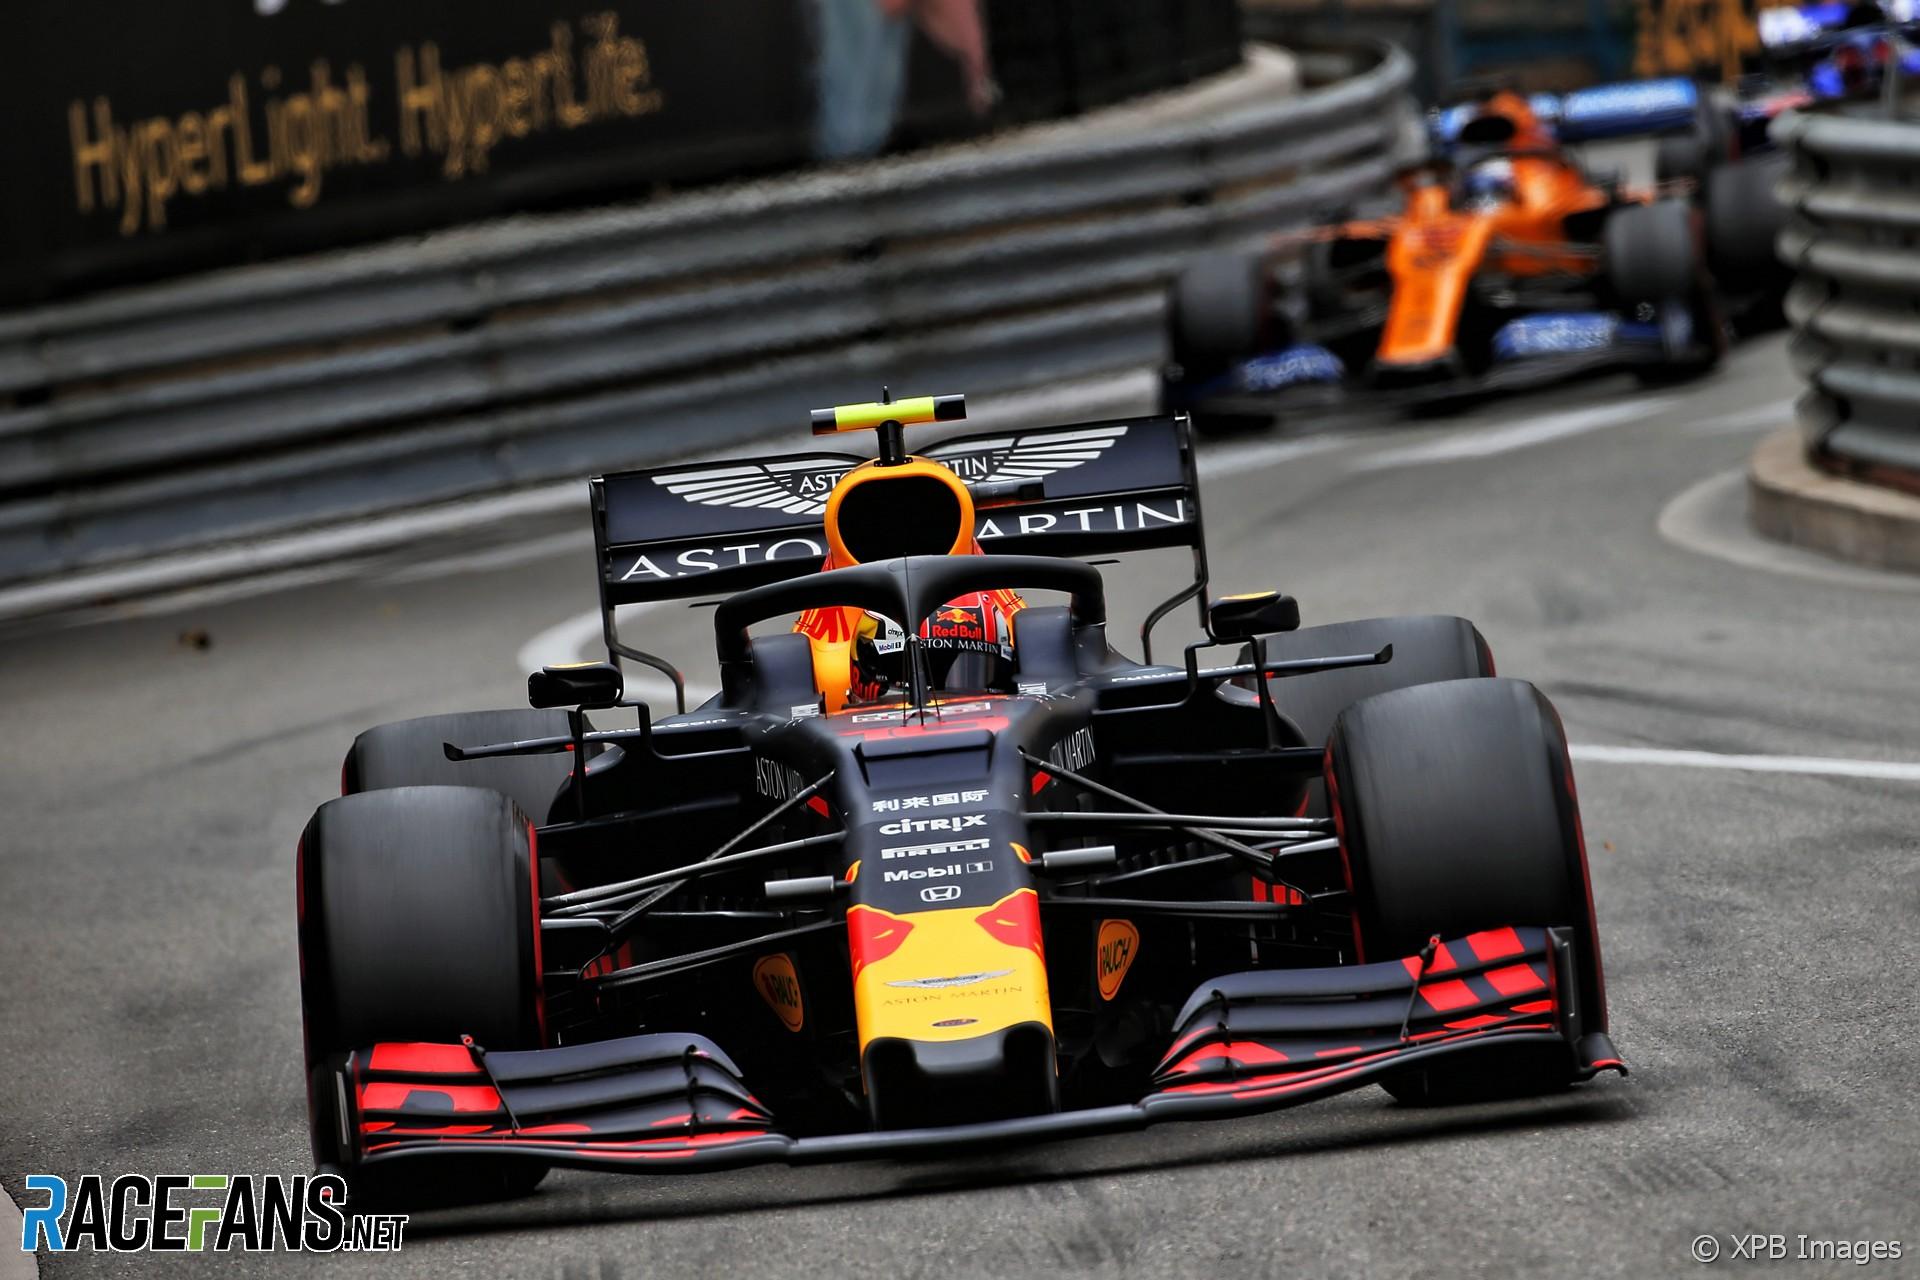 2019 Monaco Grand Prix In Pictures Racefans